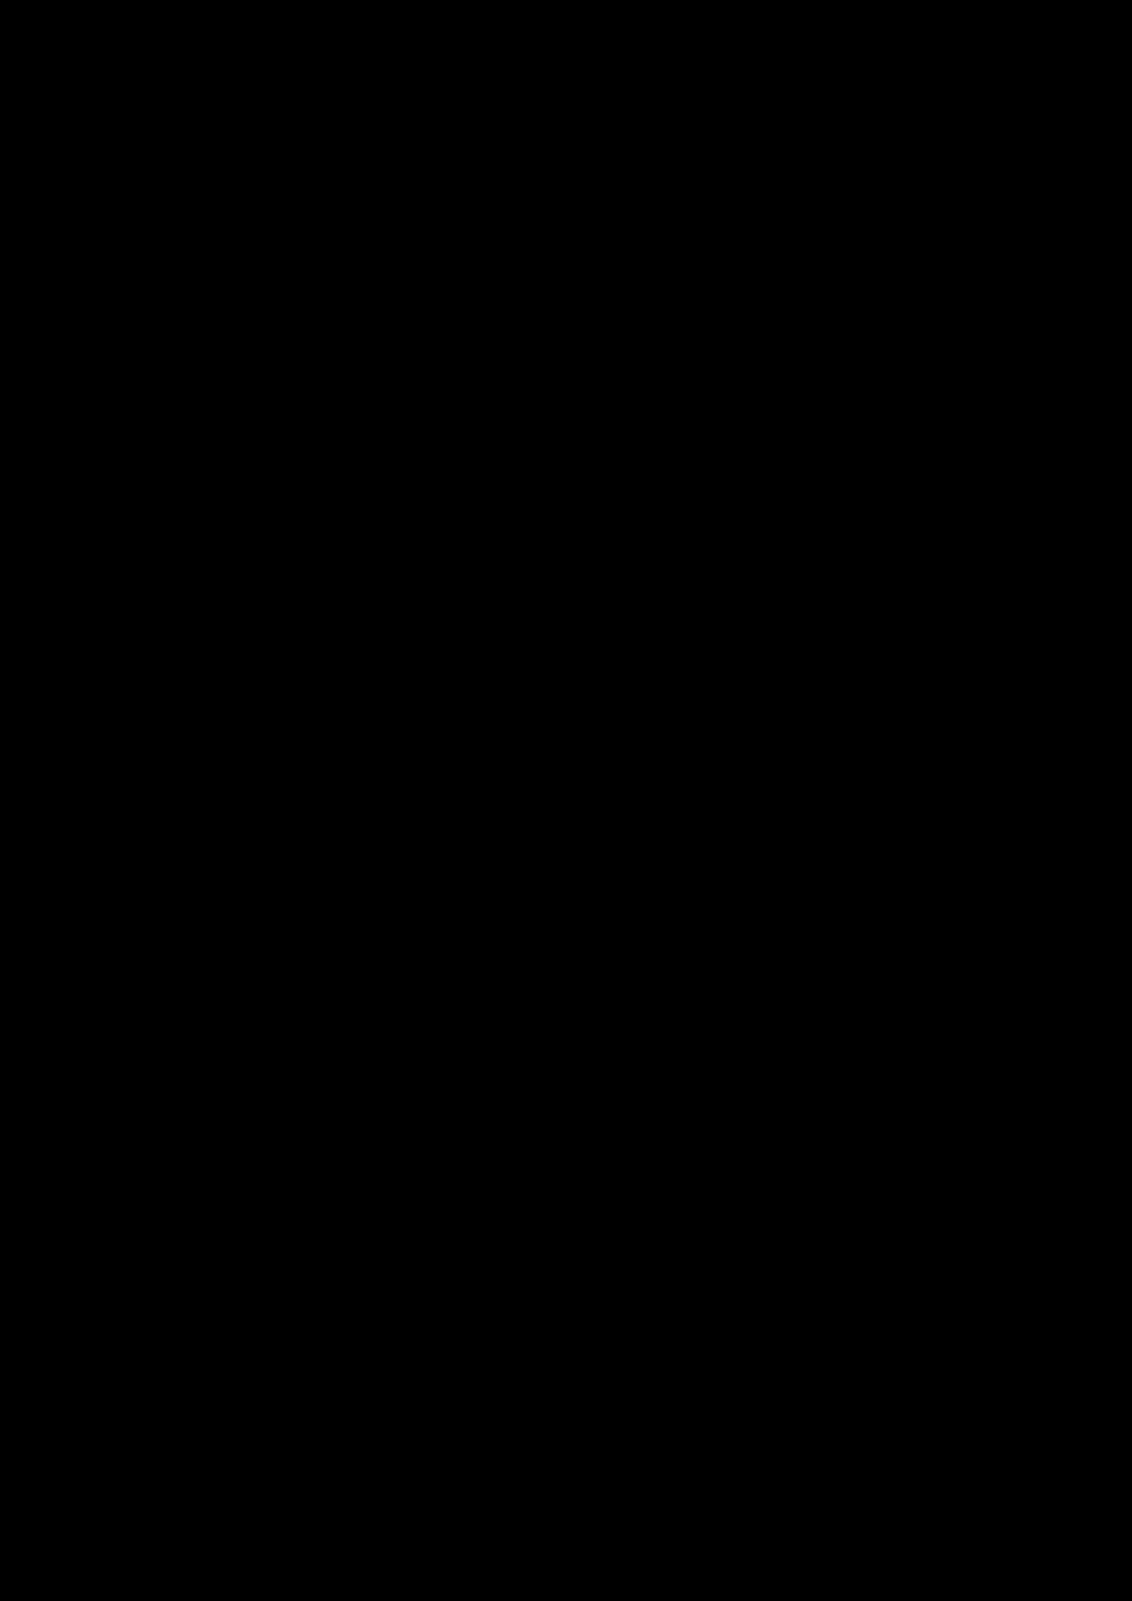 Ten lyubvi slide, Image 6